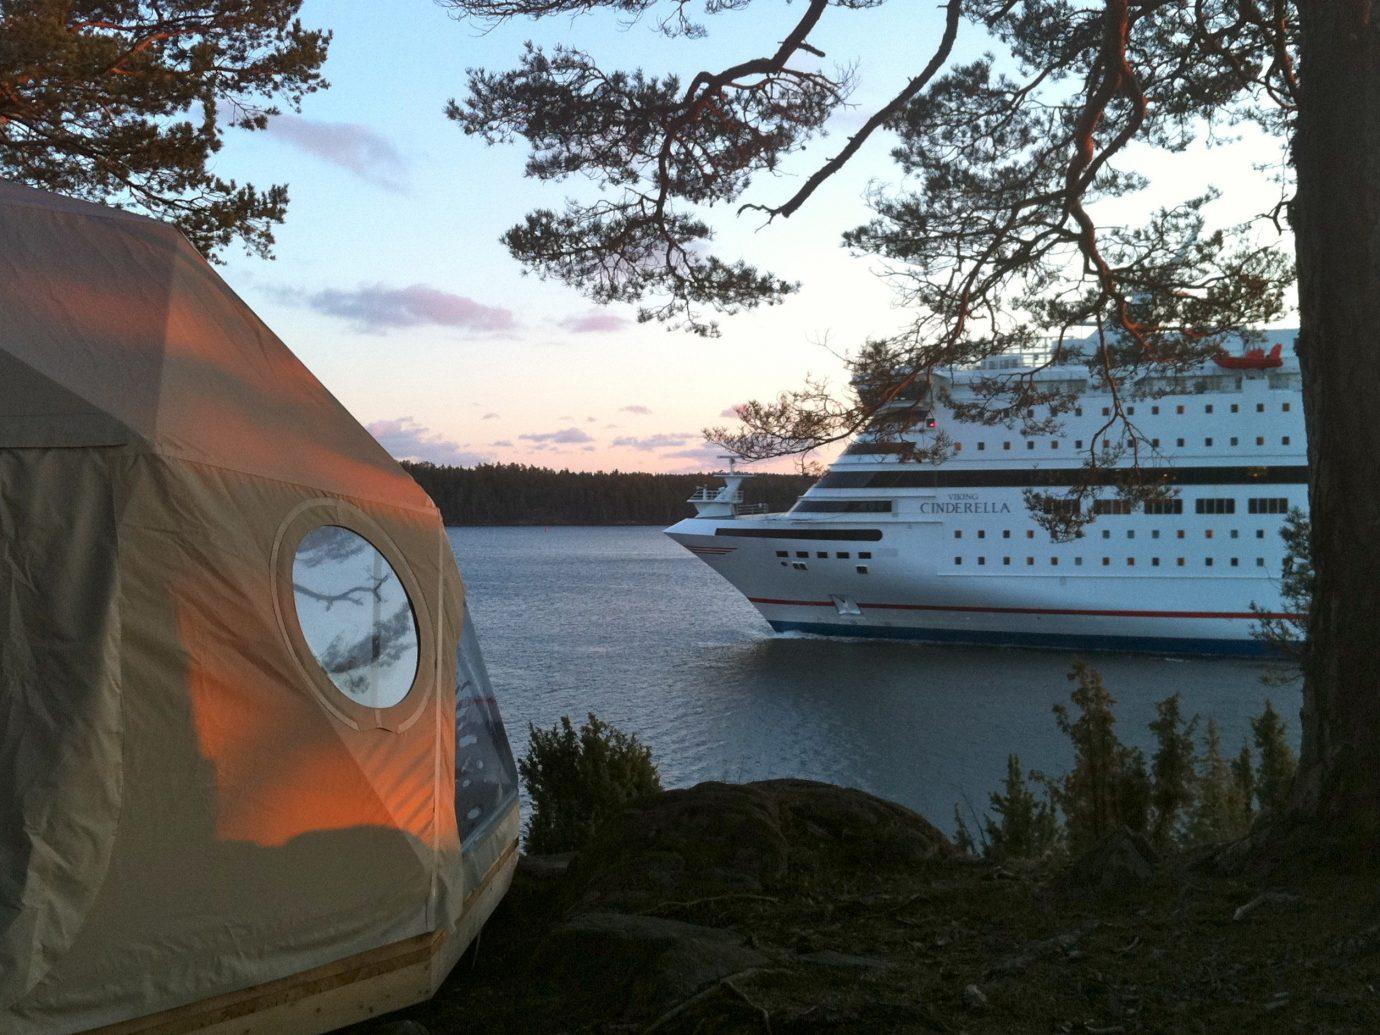 Island Lodge, Sweden